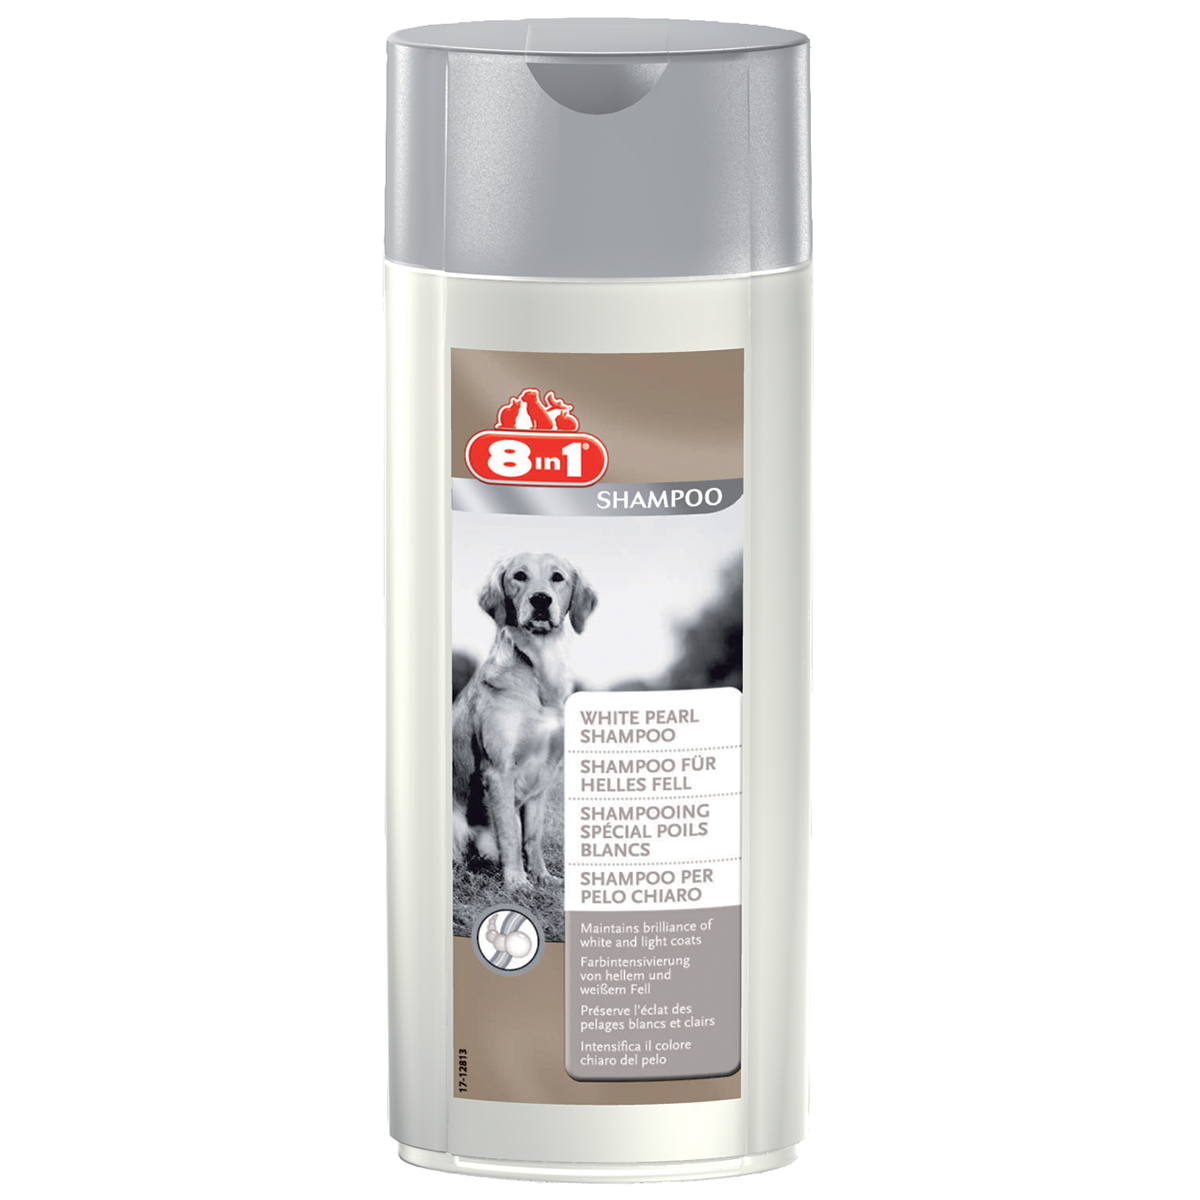 8 in 1 Sampon Caine White Pearl, 250 ml imagine